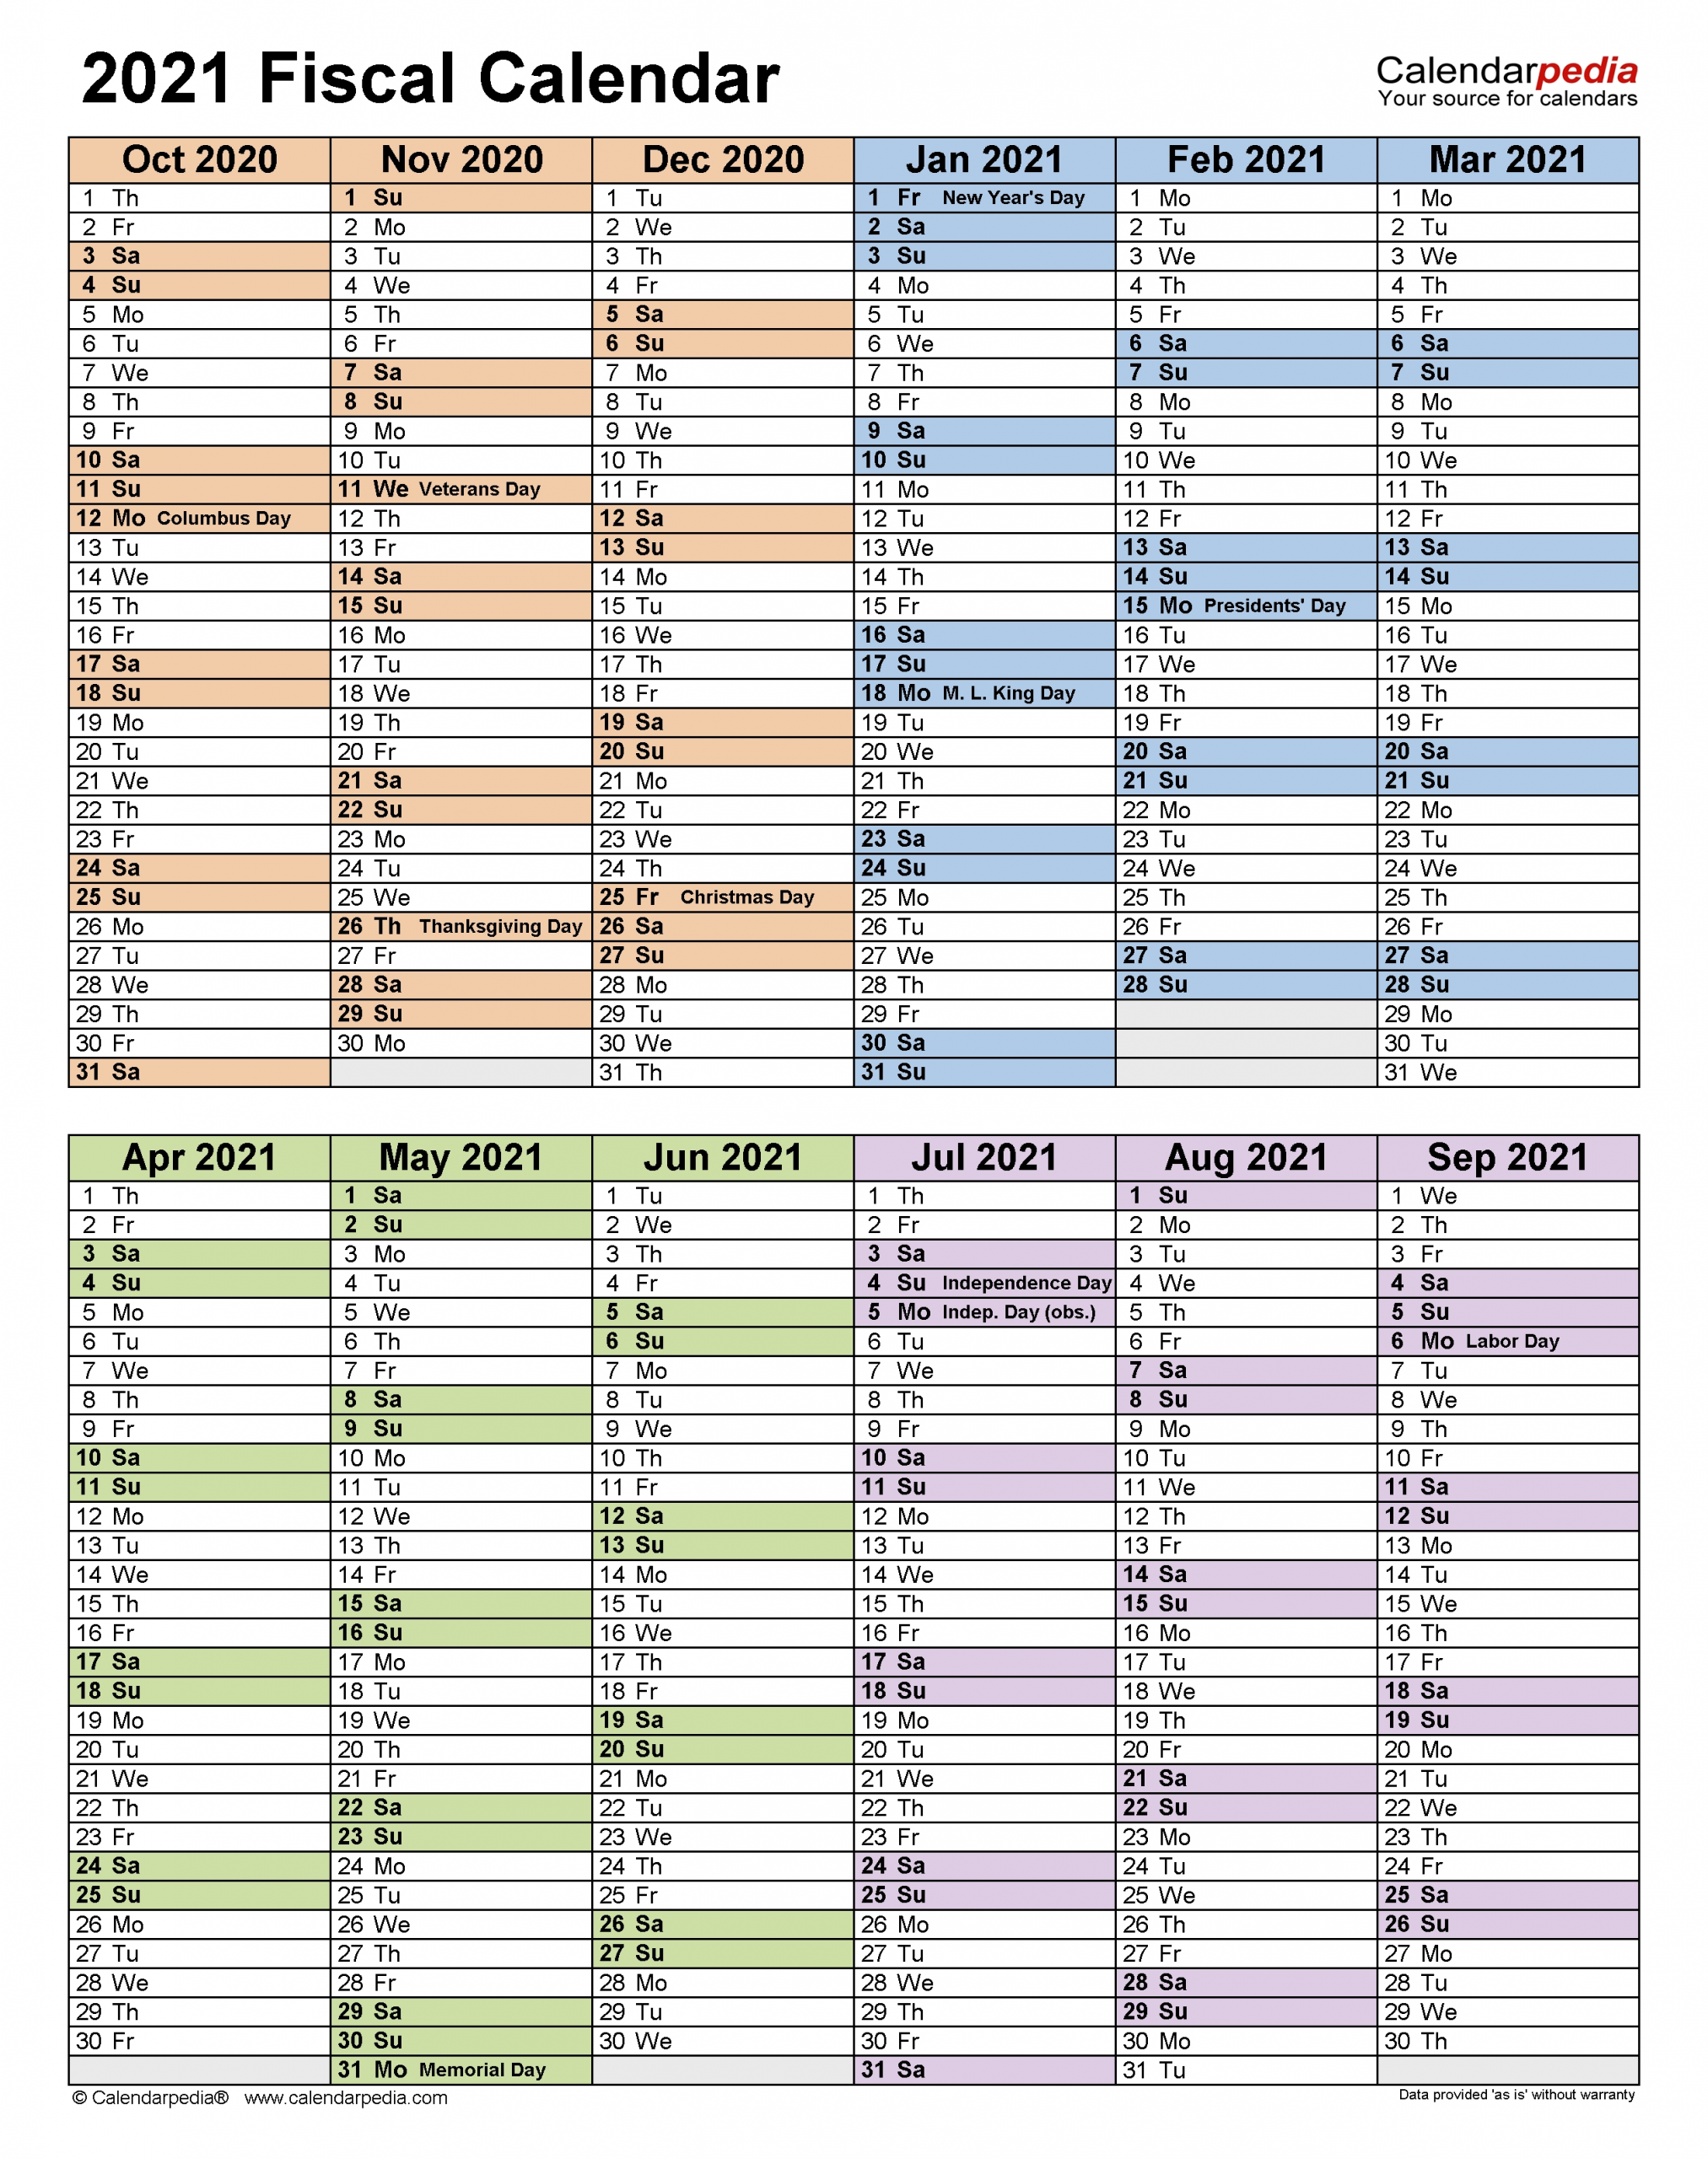 Fiscal Calendars 2021 - Free Printable Pdf Templates  2021 2020 Financial Year Cycle Australia